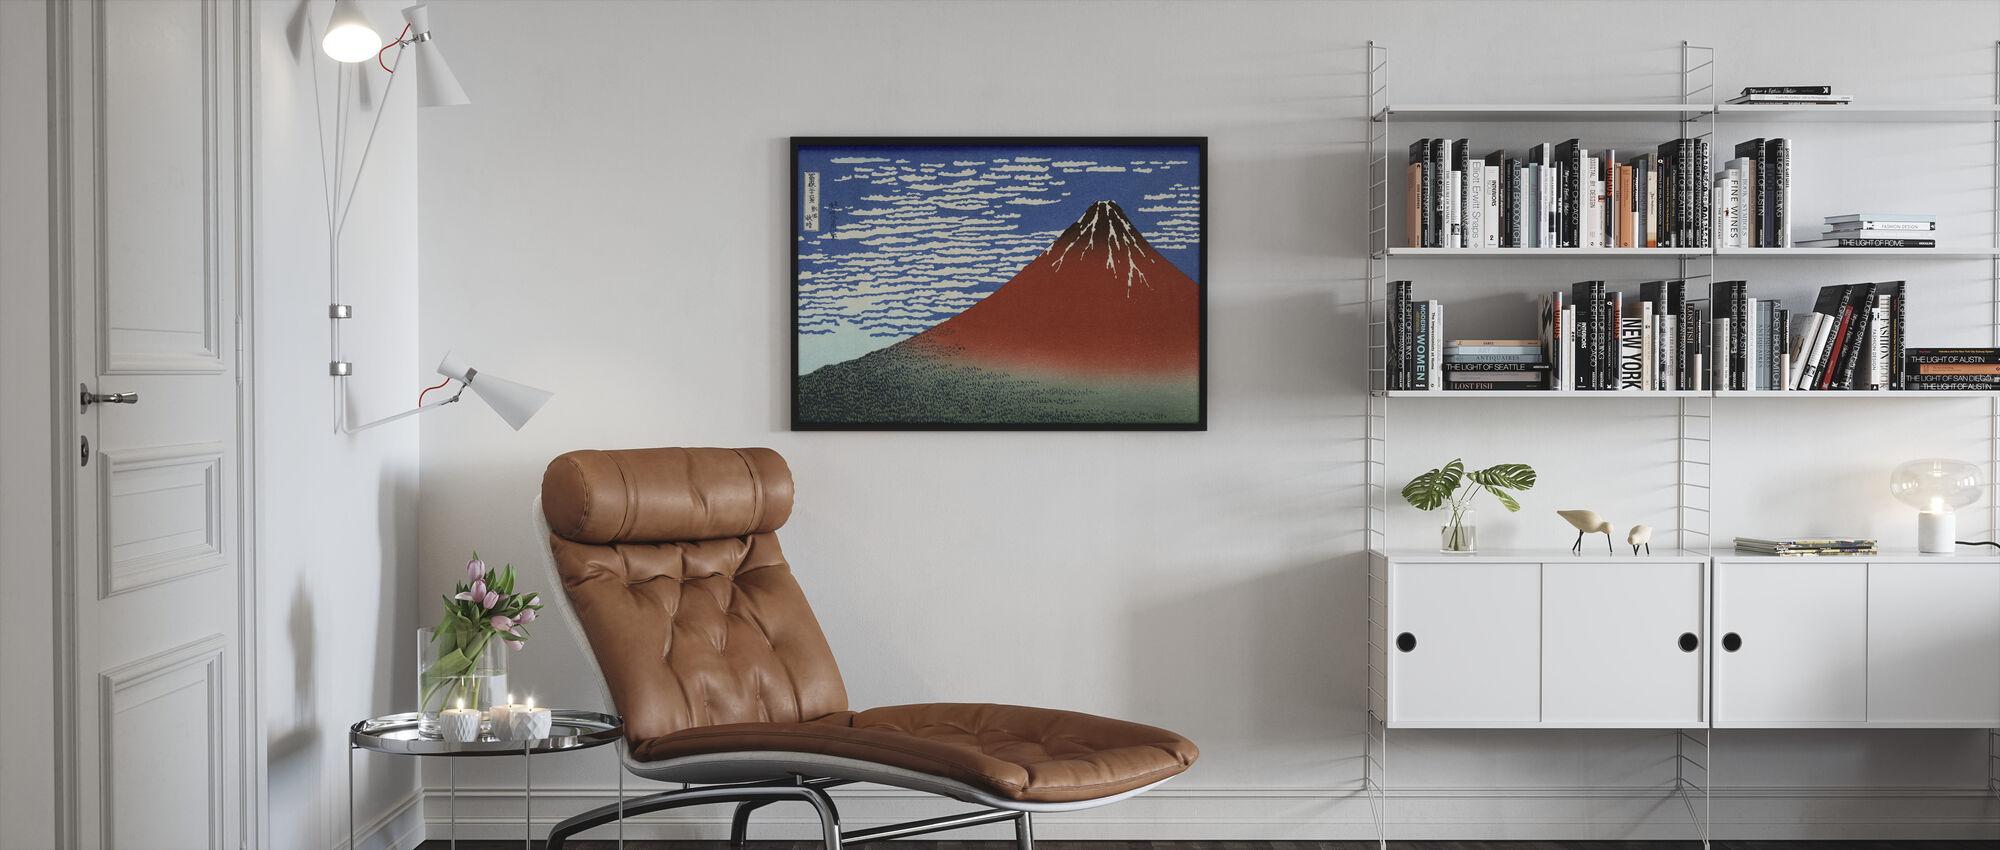 Red Fuji, Katsushika Hokusai - Gerahmtes bild - Wohnzimmer